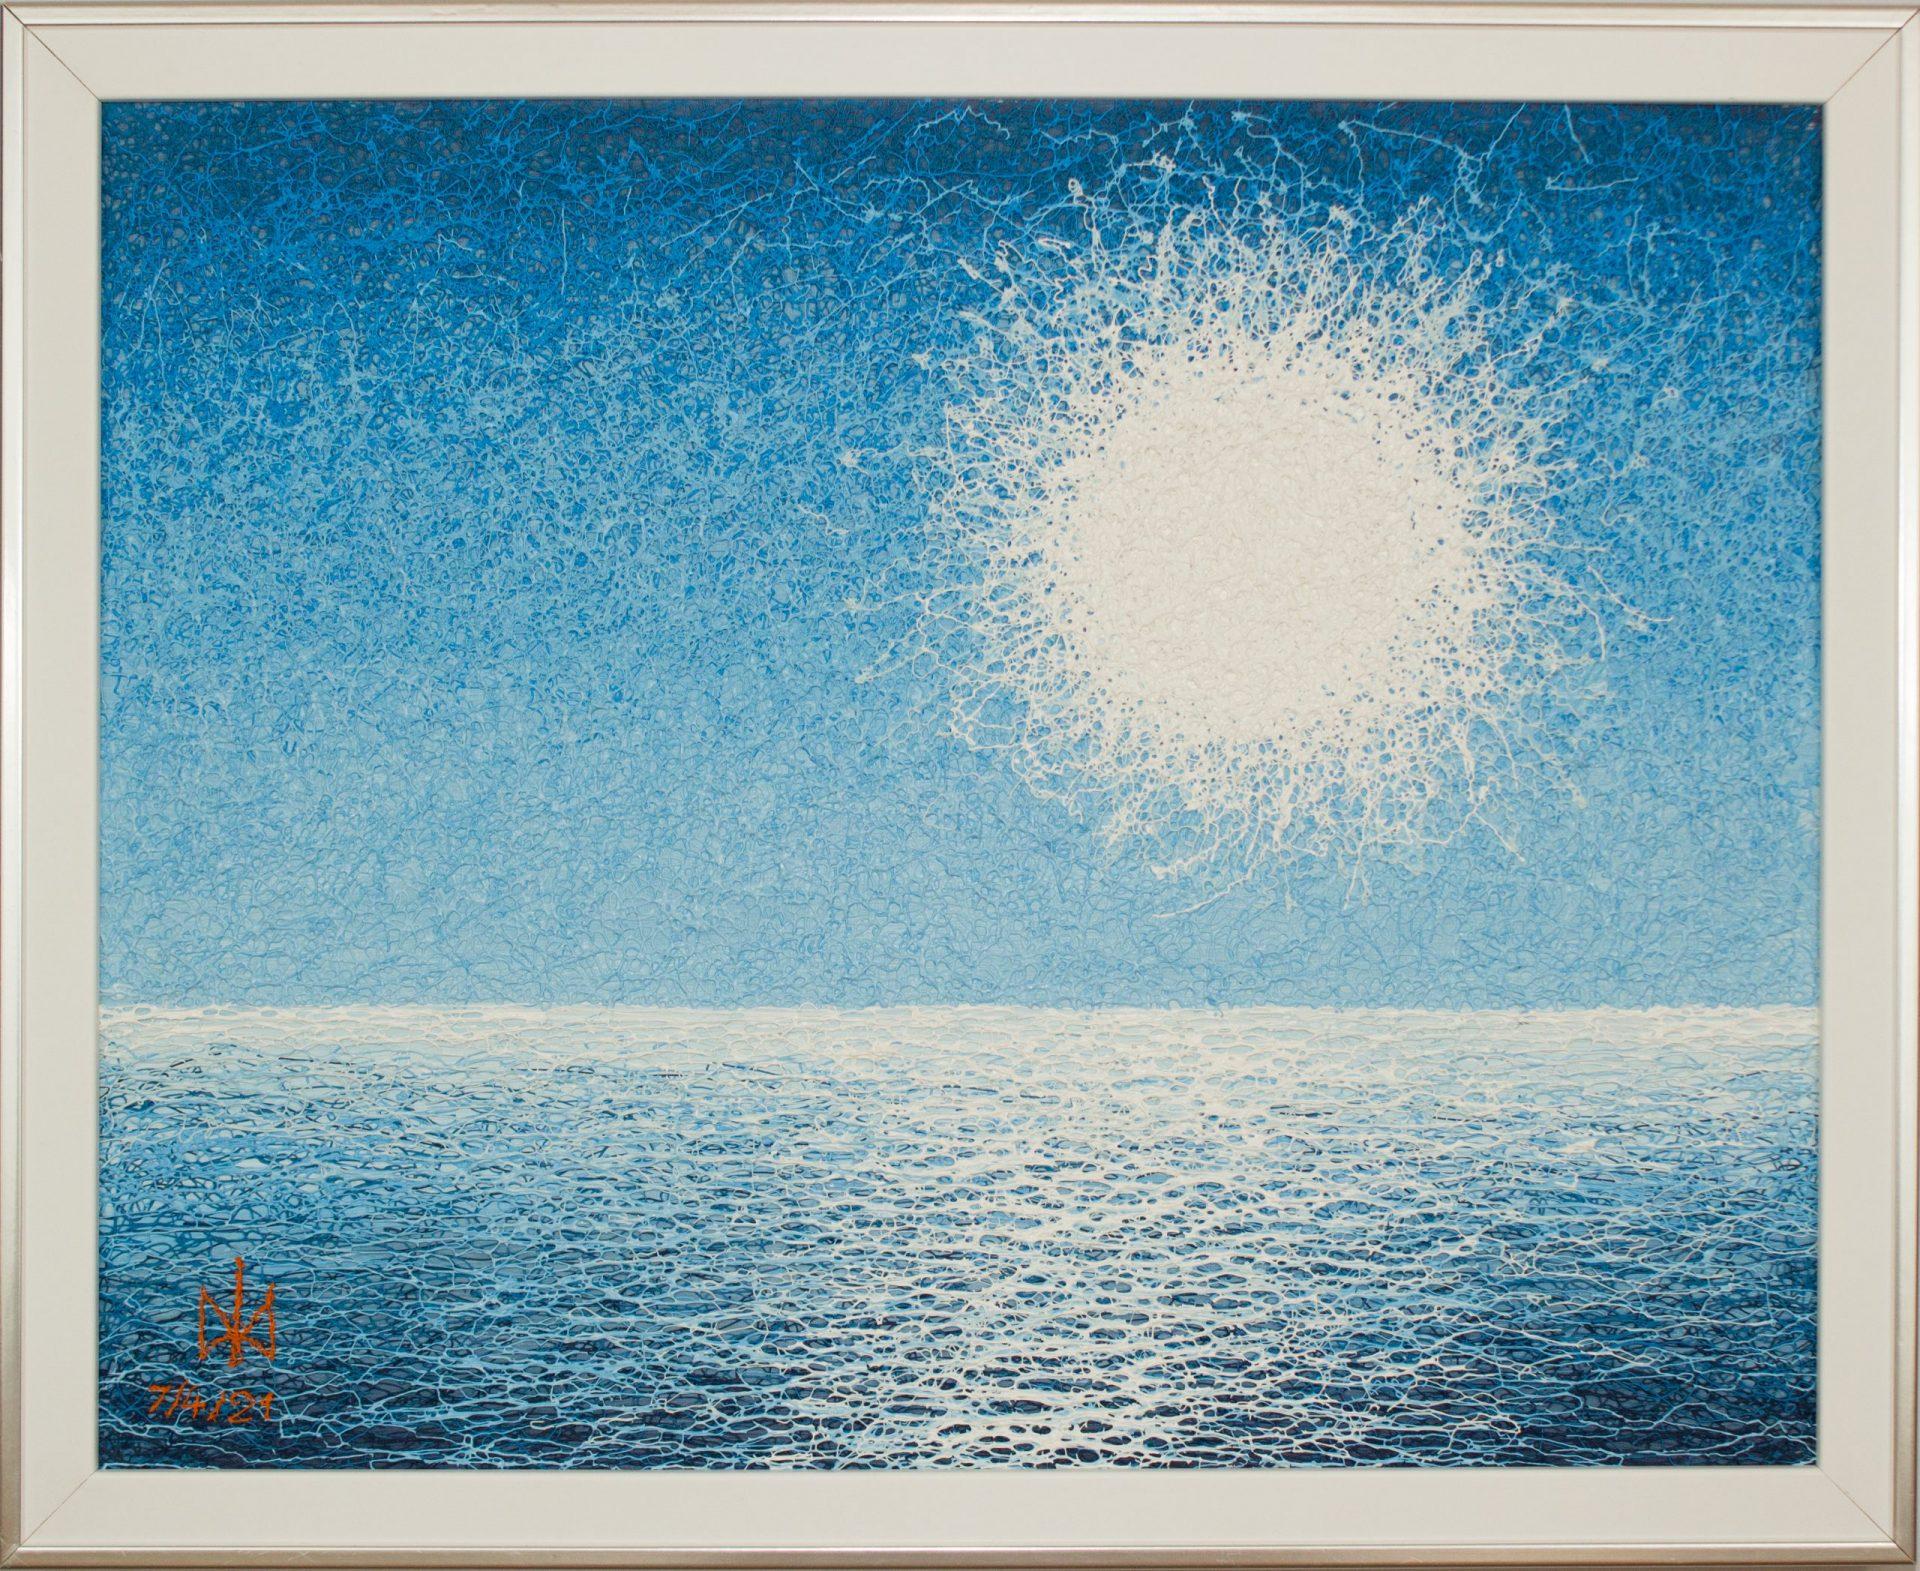 Sea sun. Plyontanism. Acrylic. Canvas board.